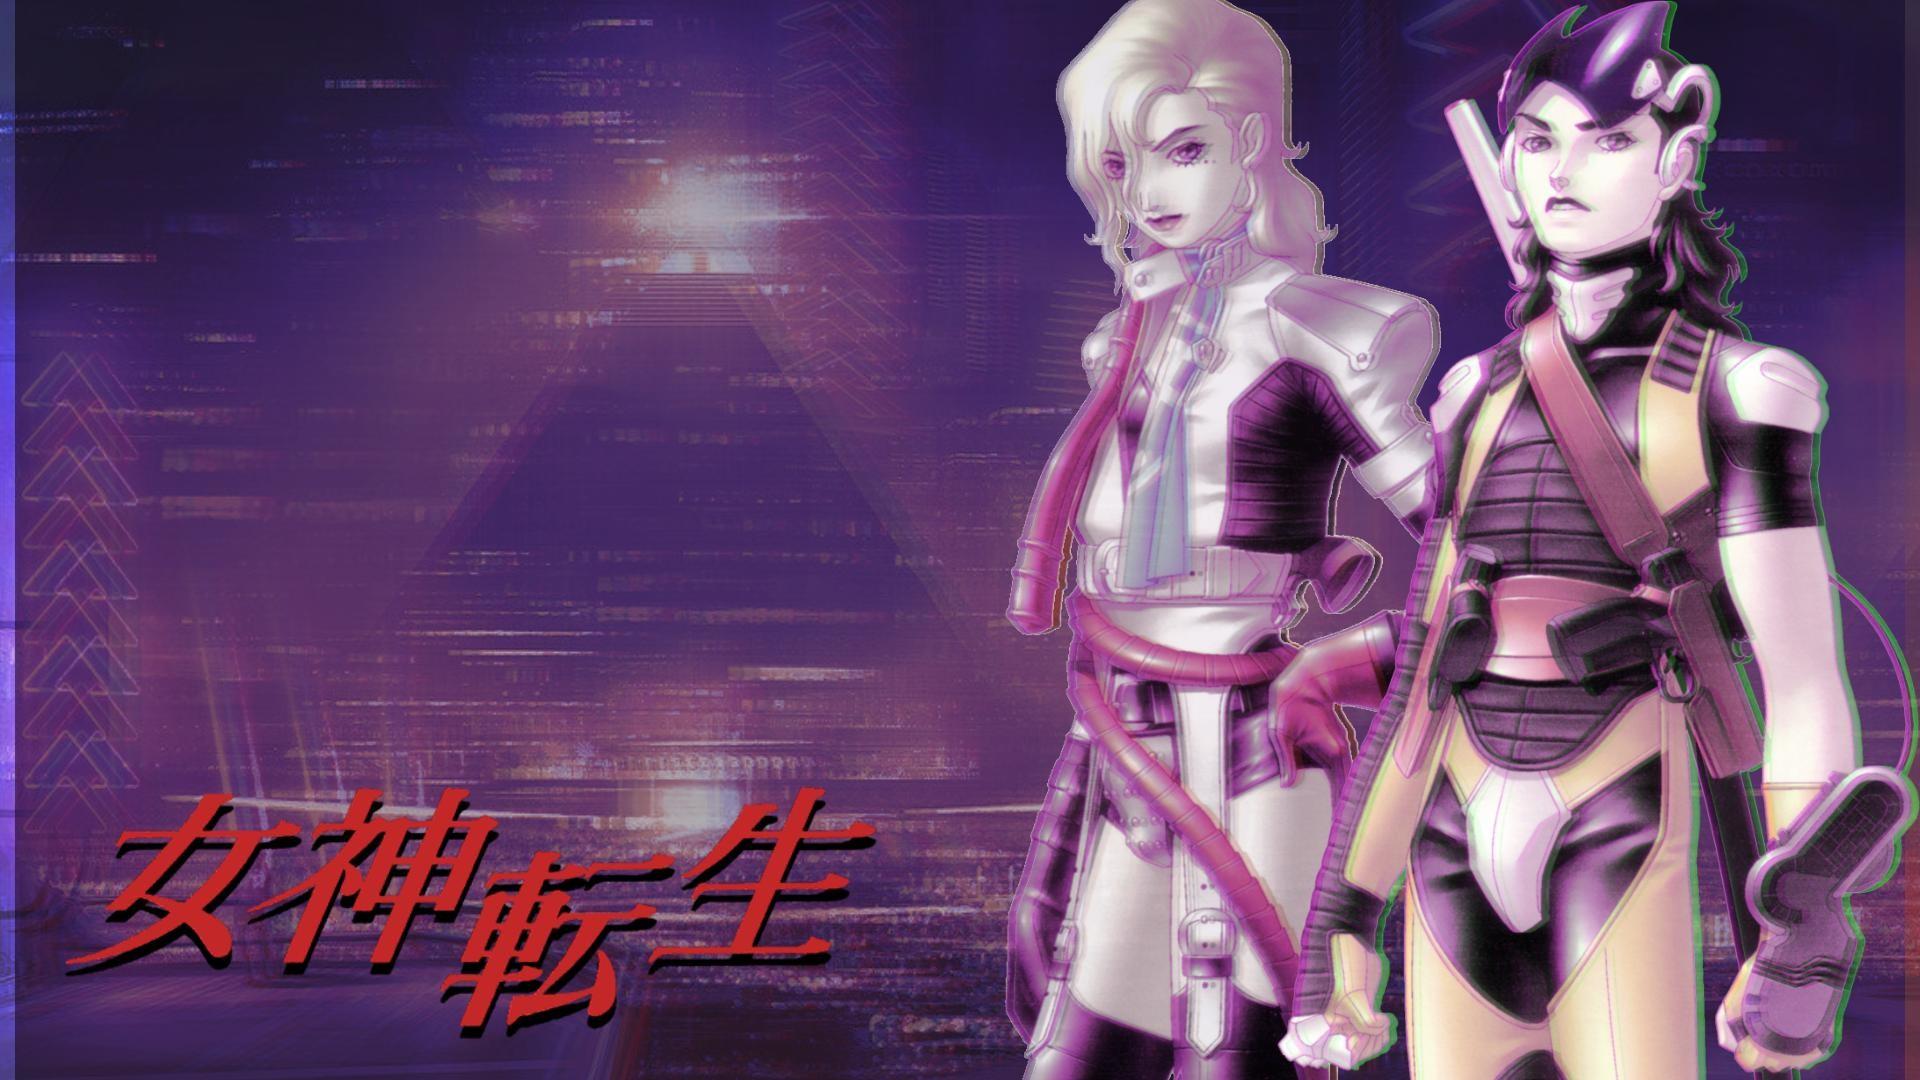 Res: 1920x1080, Shin Megami Tensei II Wallpaper